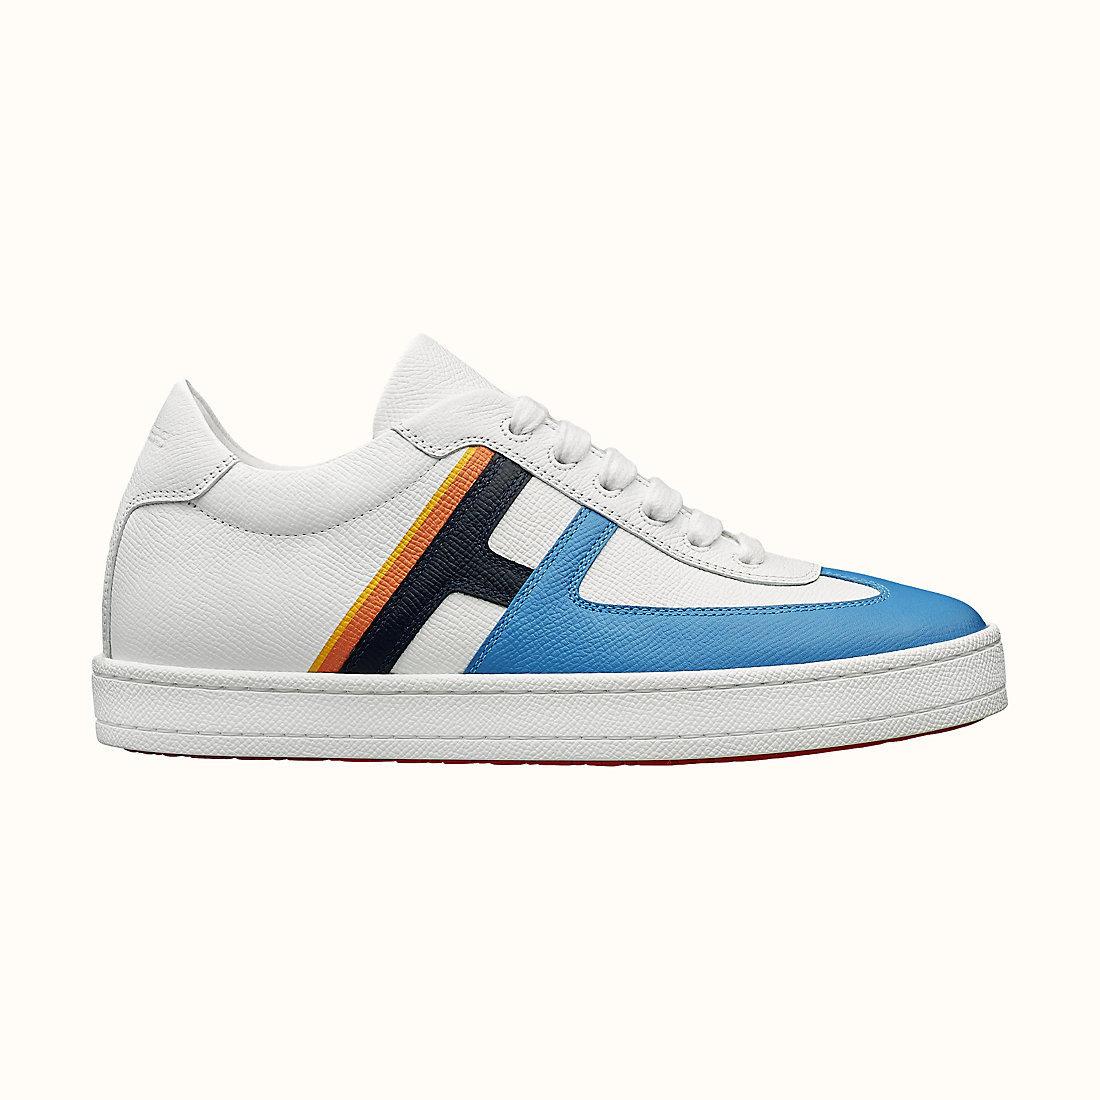 HERMES Boomerang Sneaker